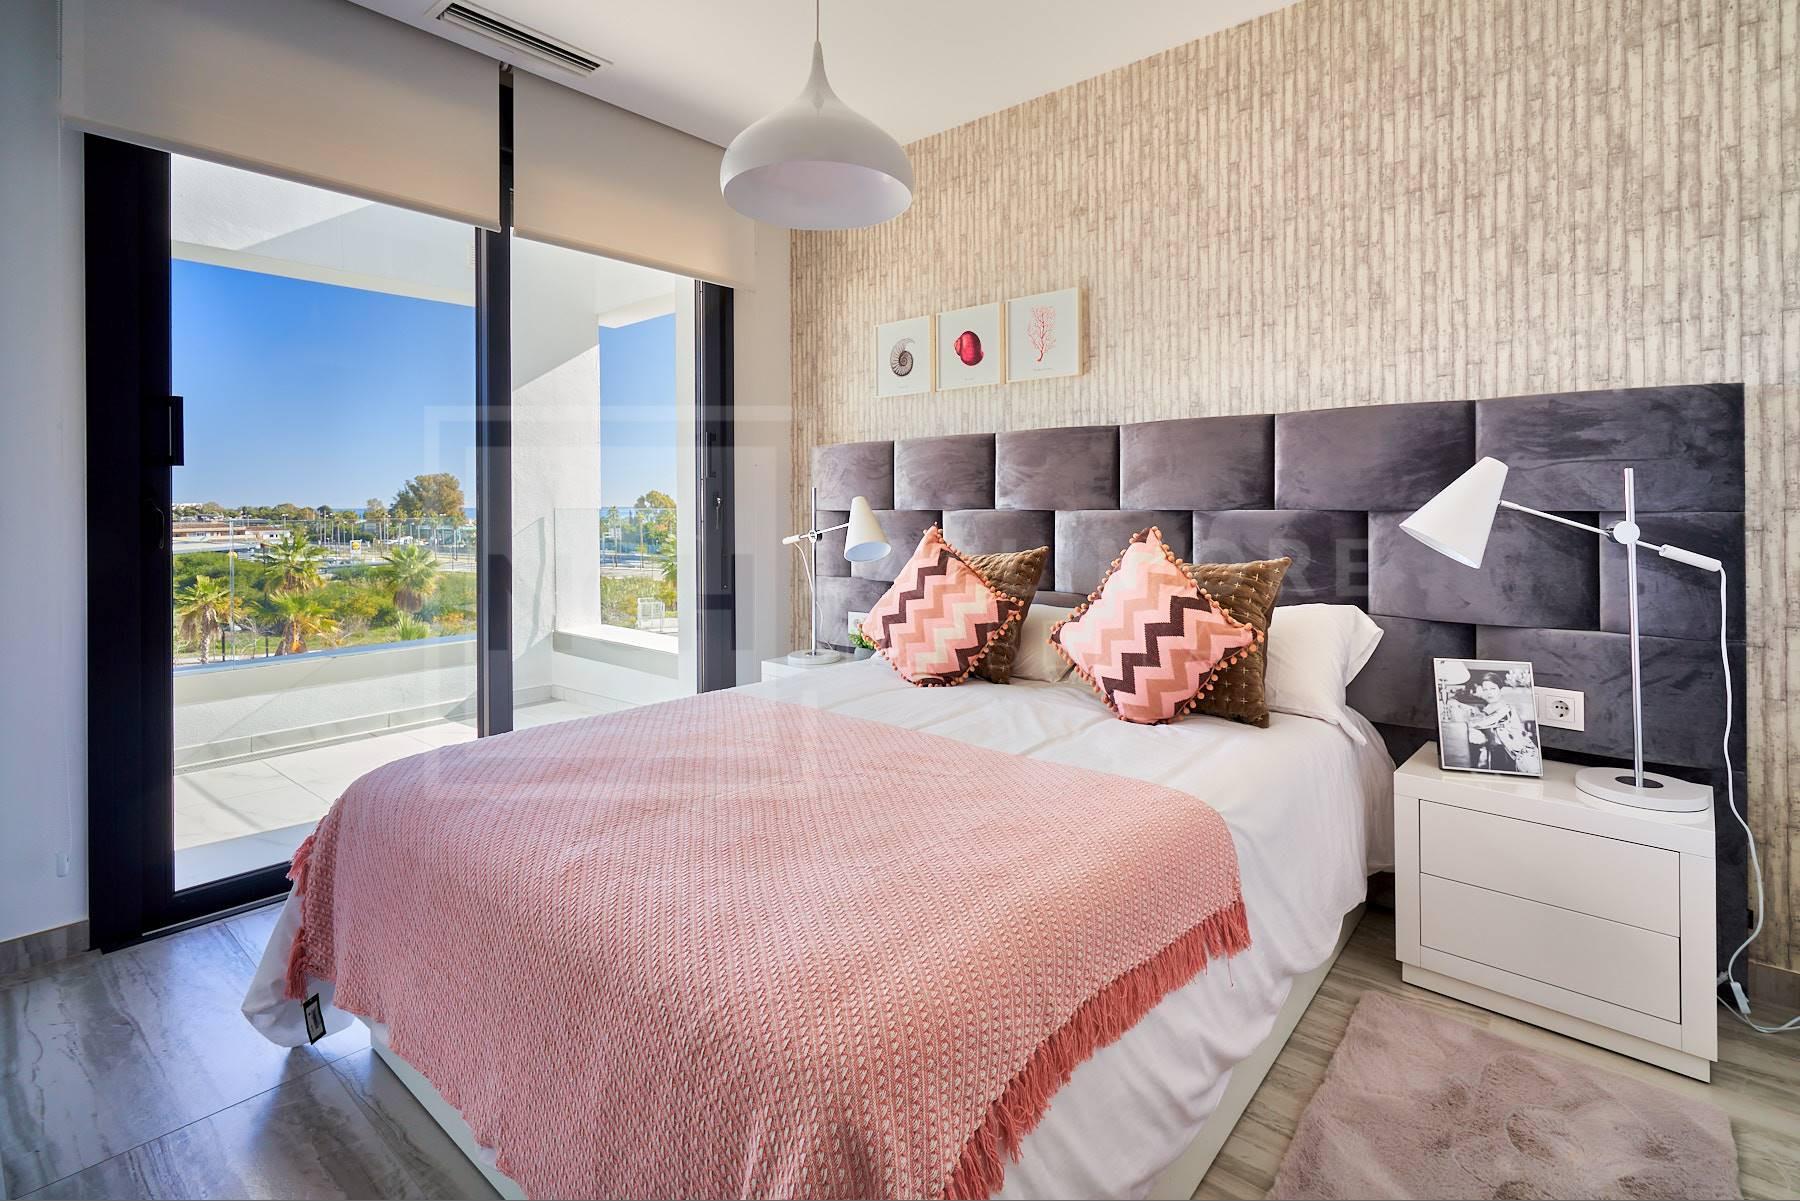 Penthouse Bel Air, Estepona – NEWPH6861